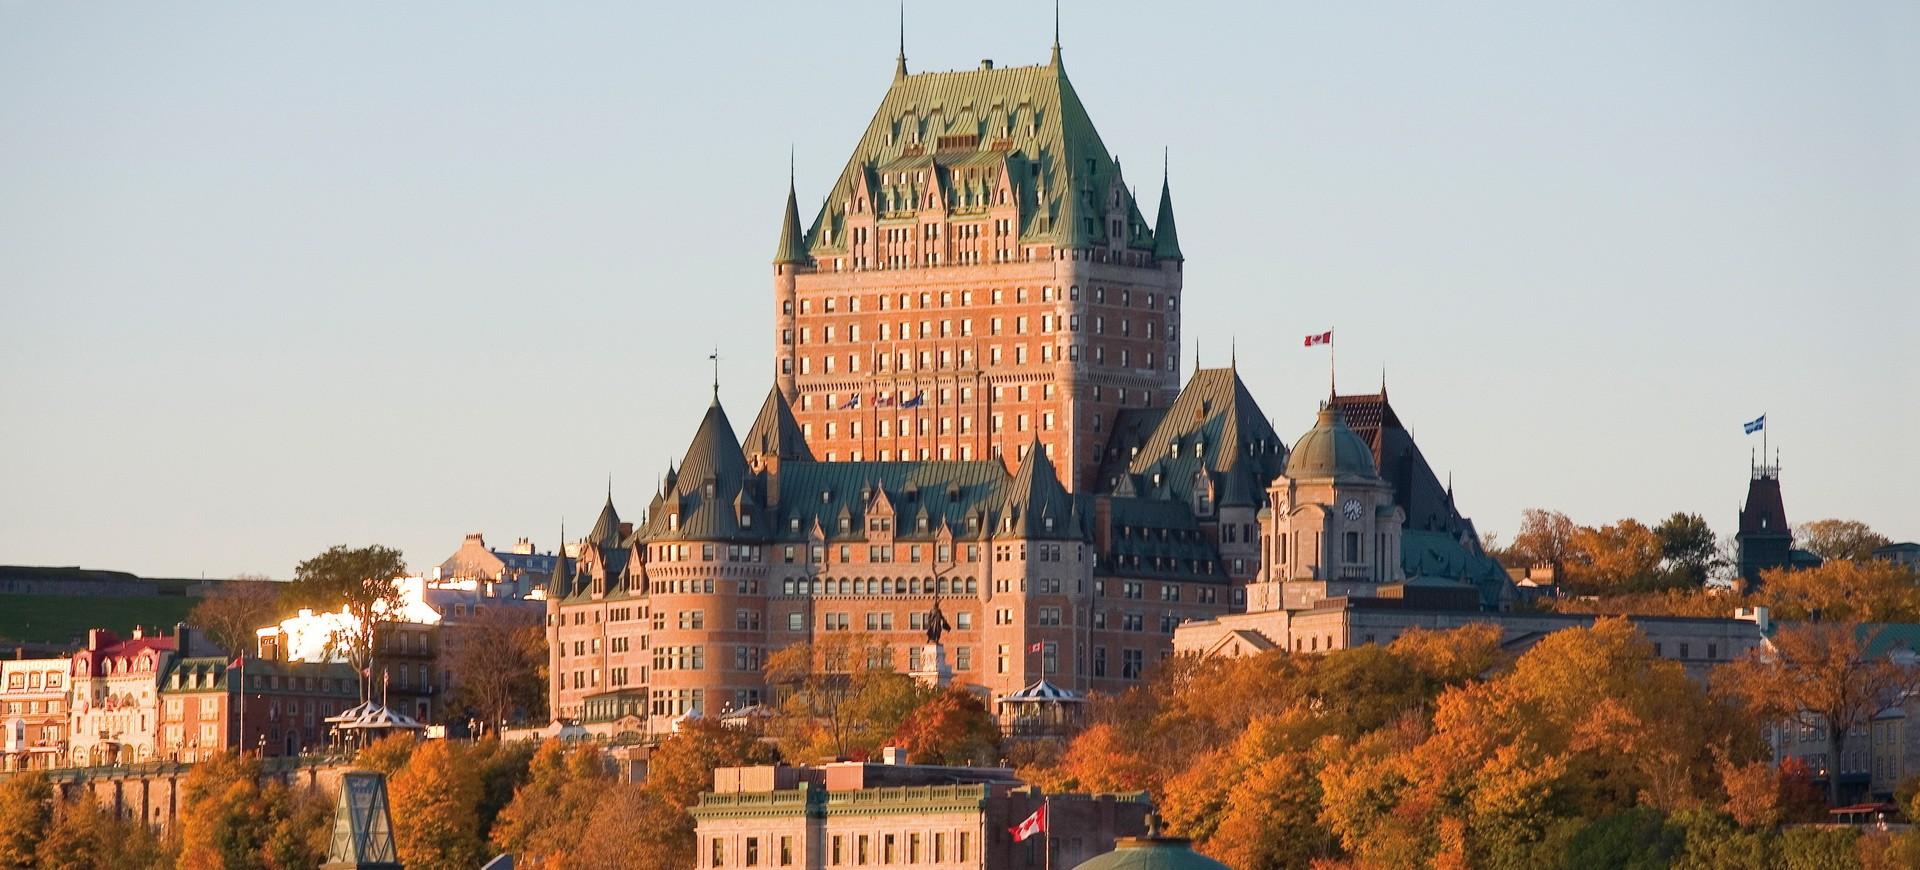 Canada Québec Château Frontenac